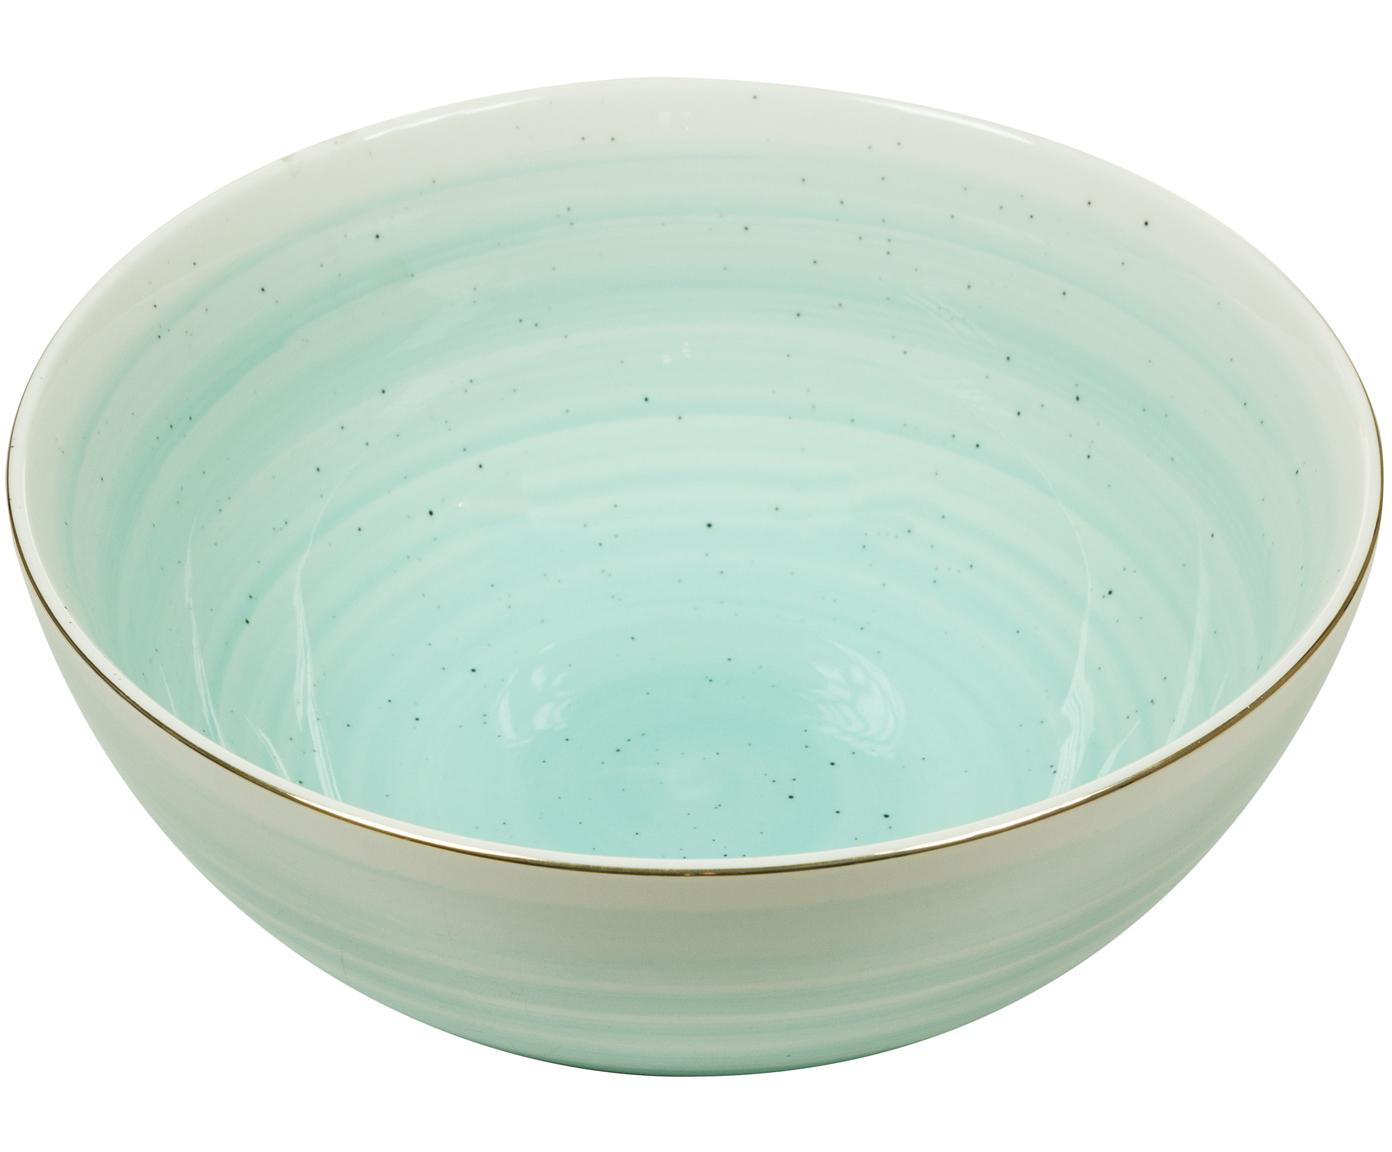 Bol artesanal Bol, Porcelana, Azul turquesa, Ø 22 x Al 10 cm